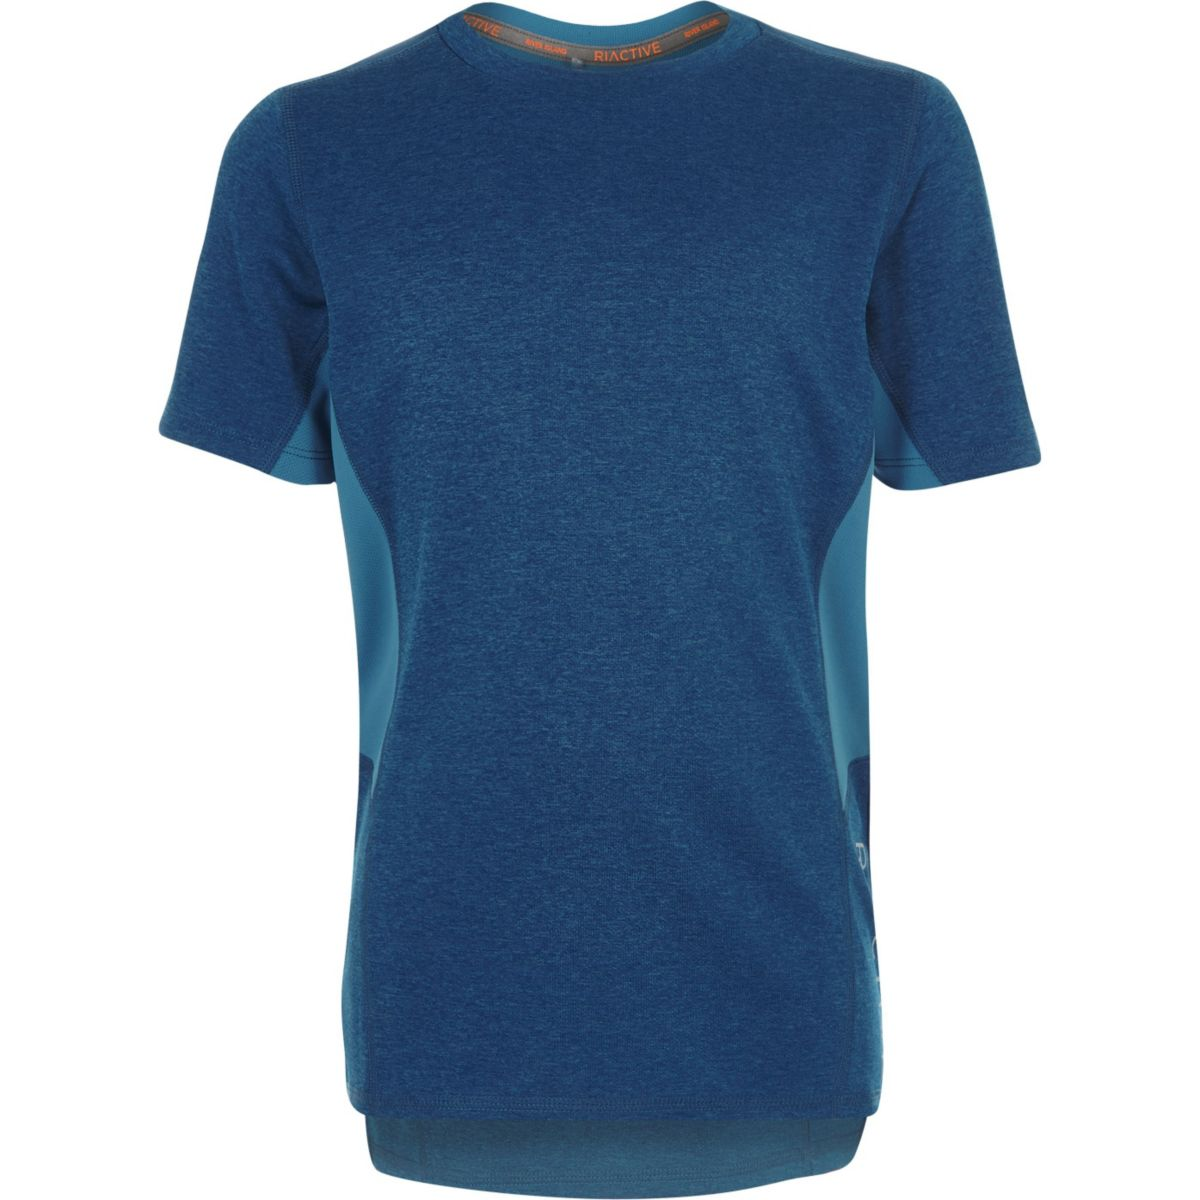 Boys RI Active blue T-Shirt